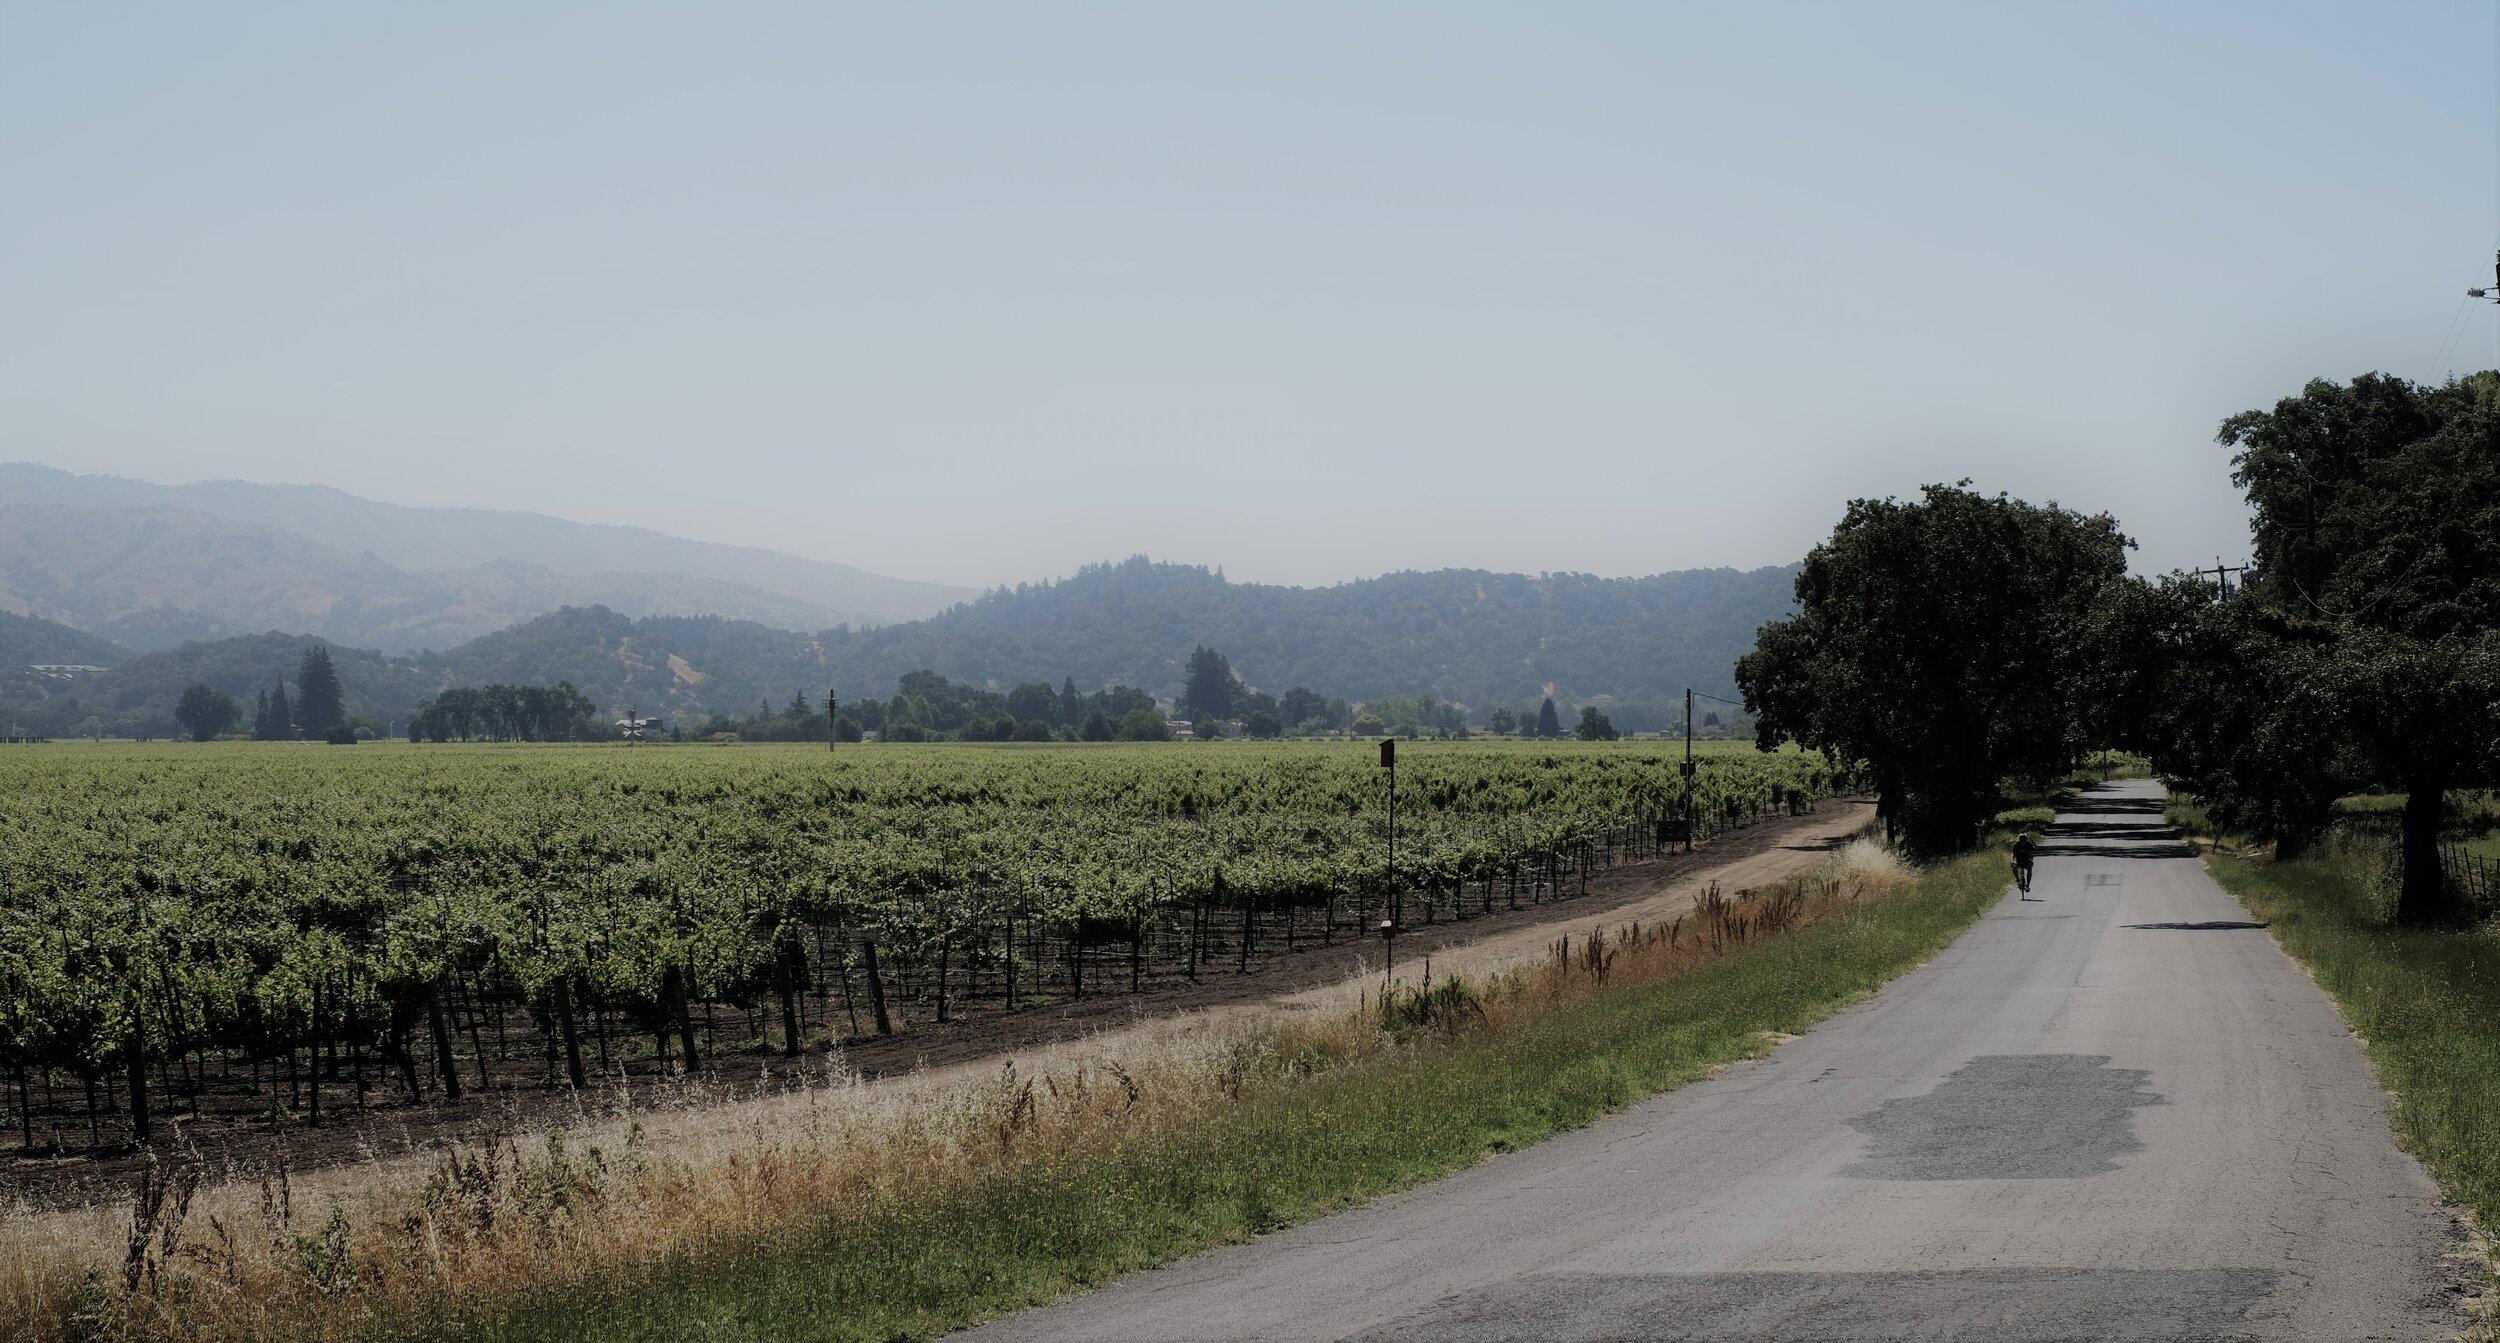 Napa Valley, California USA